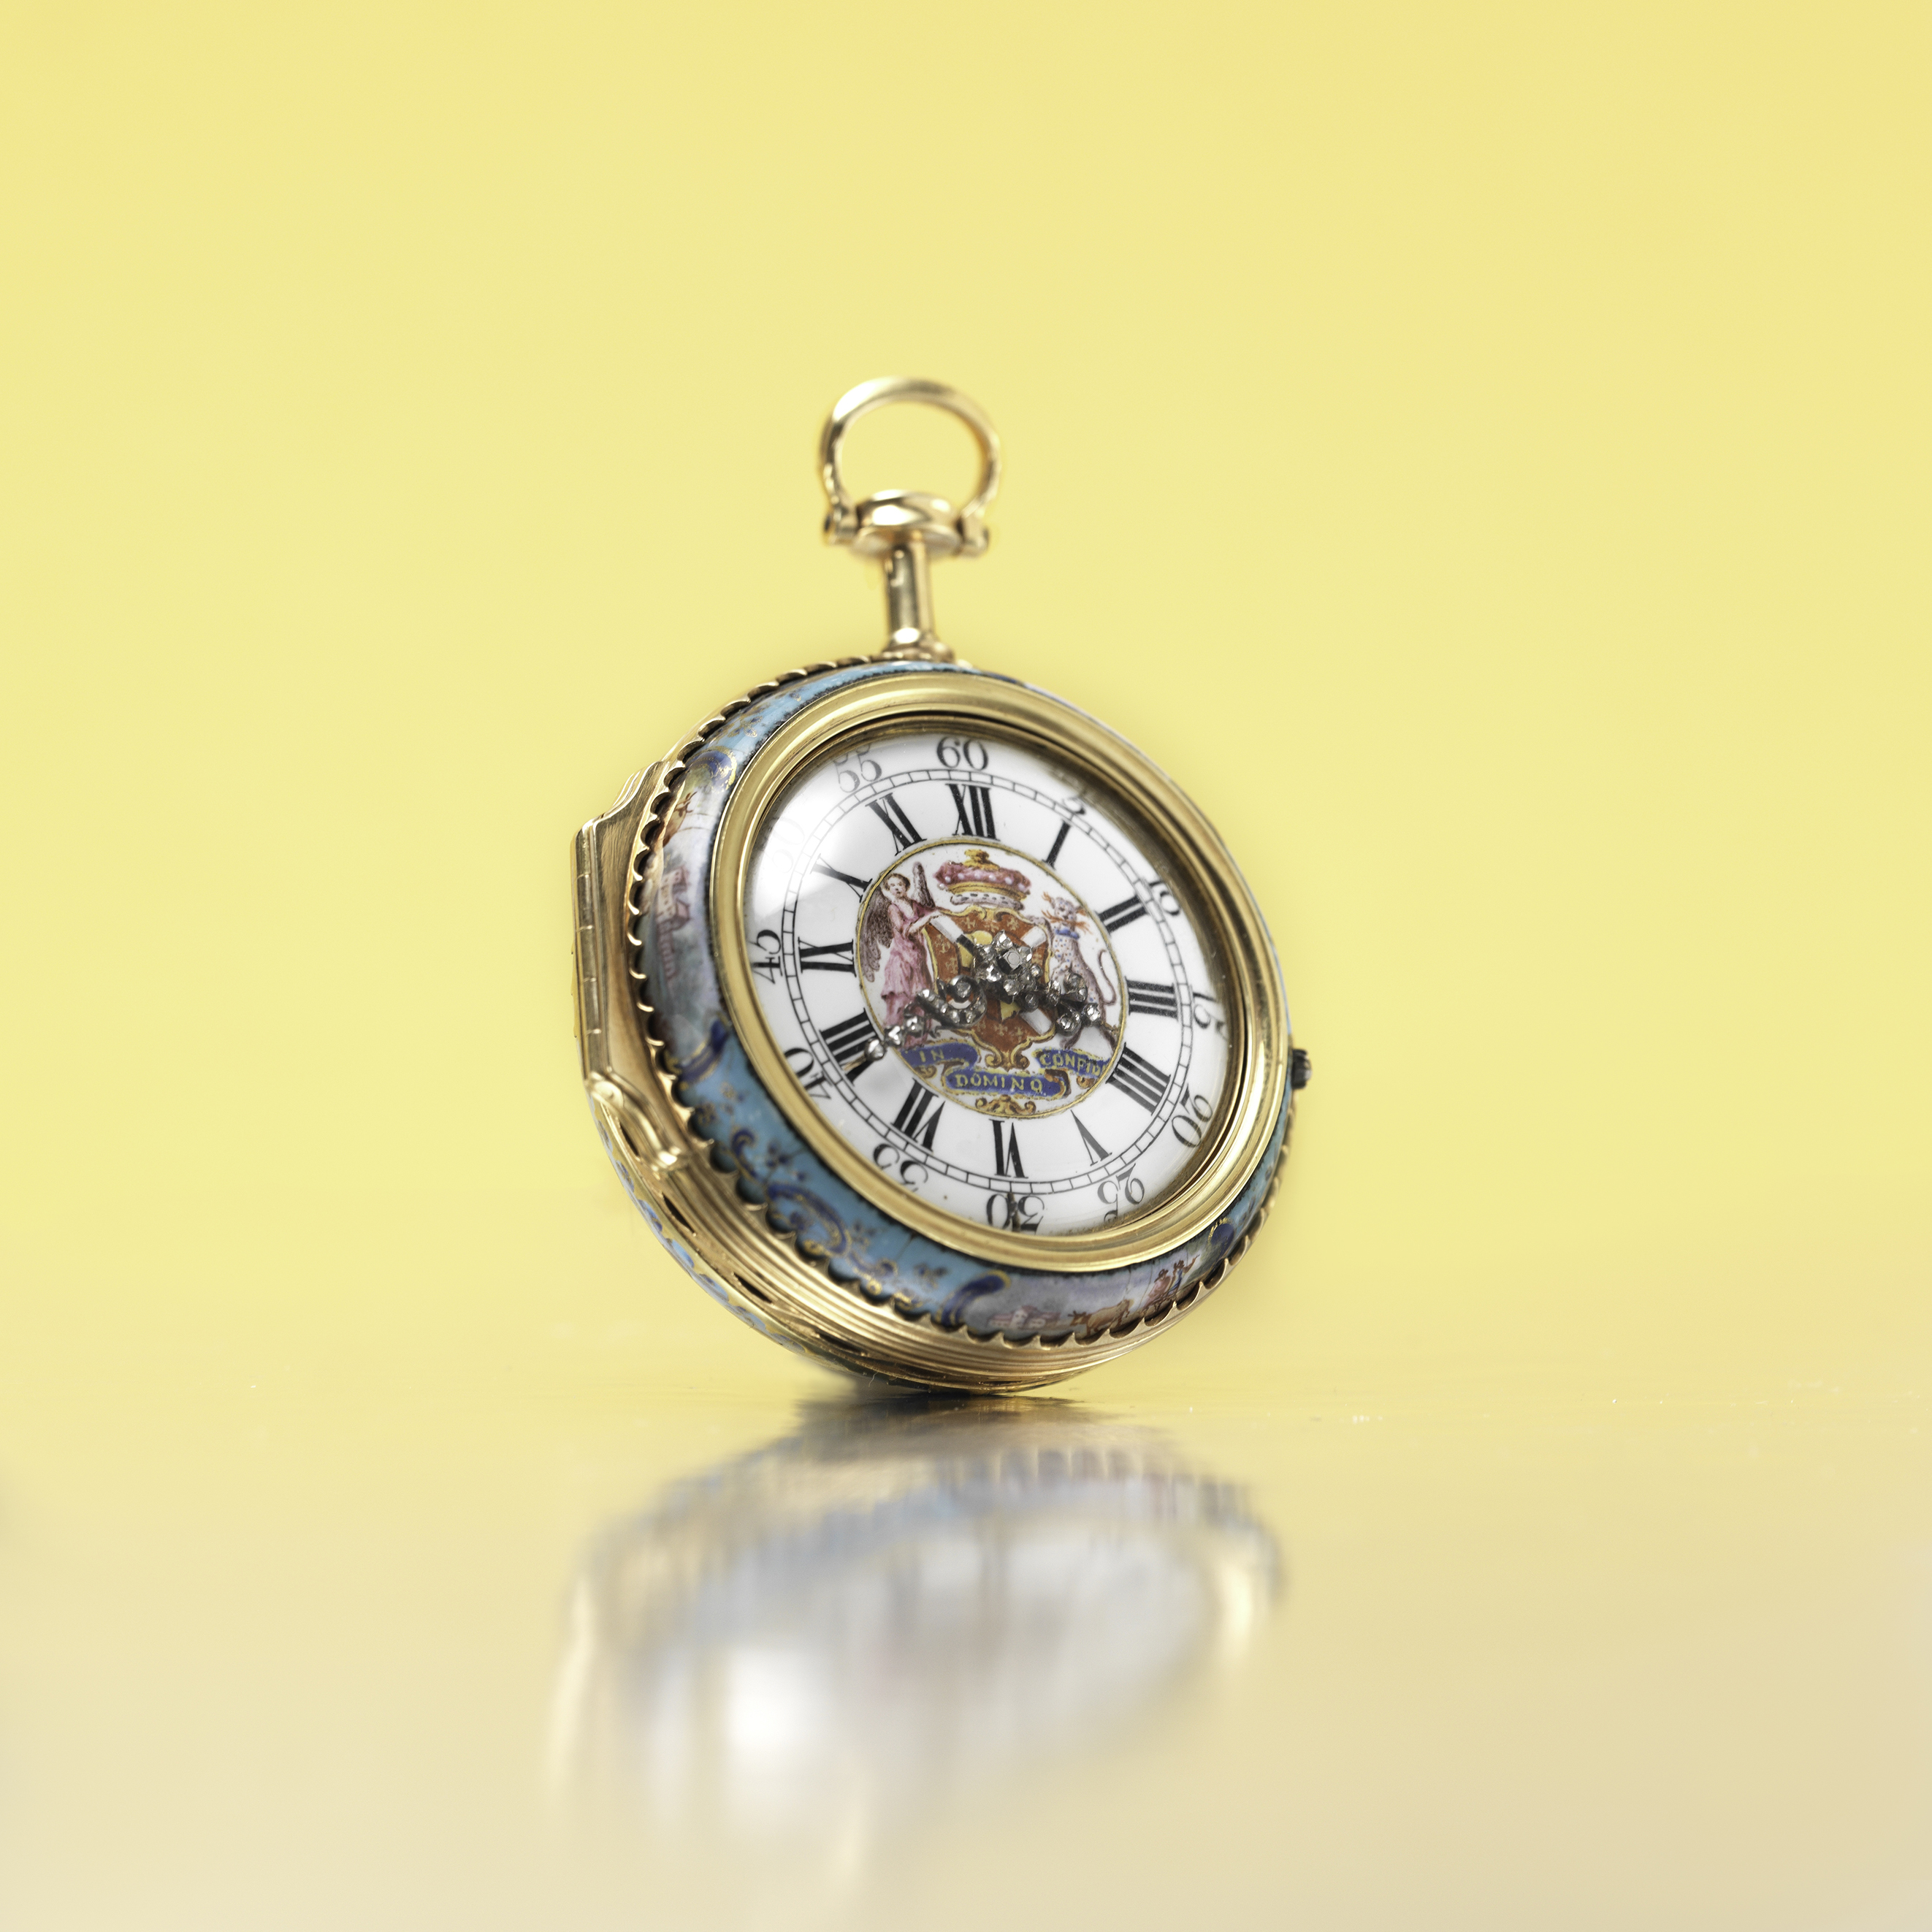 Watch 17.190.1455a, b